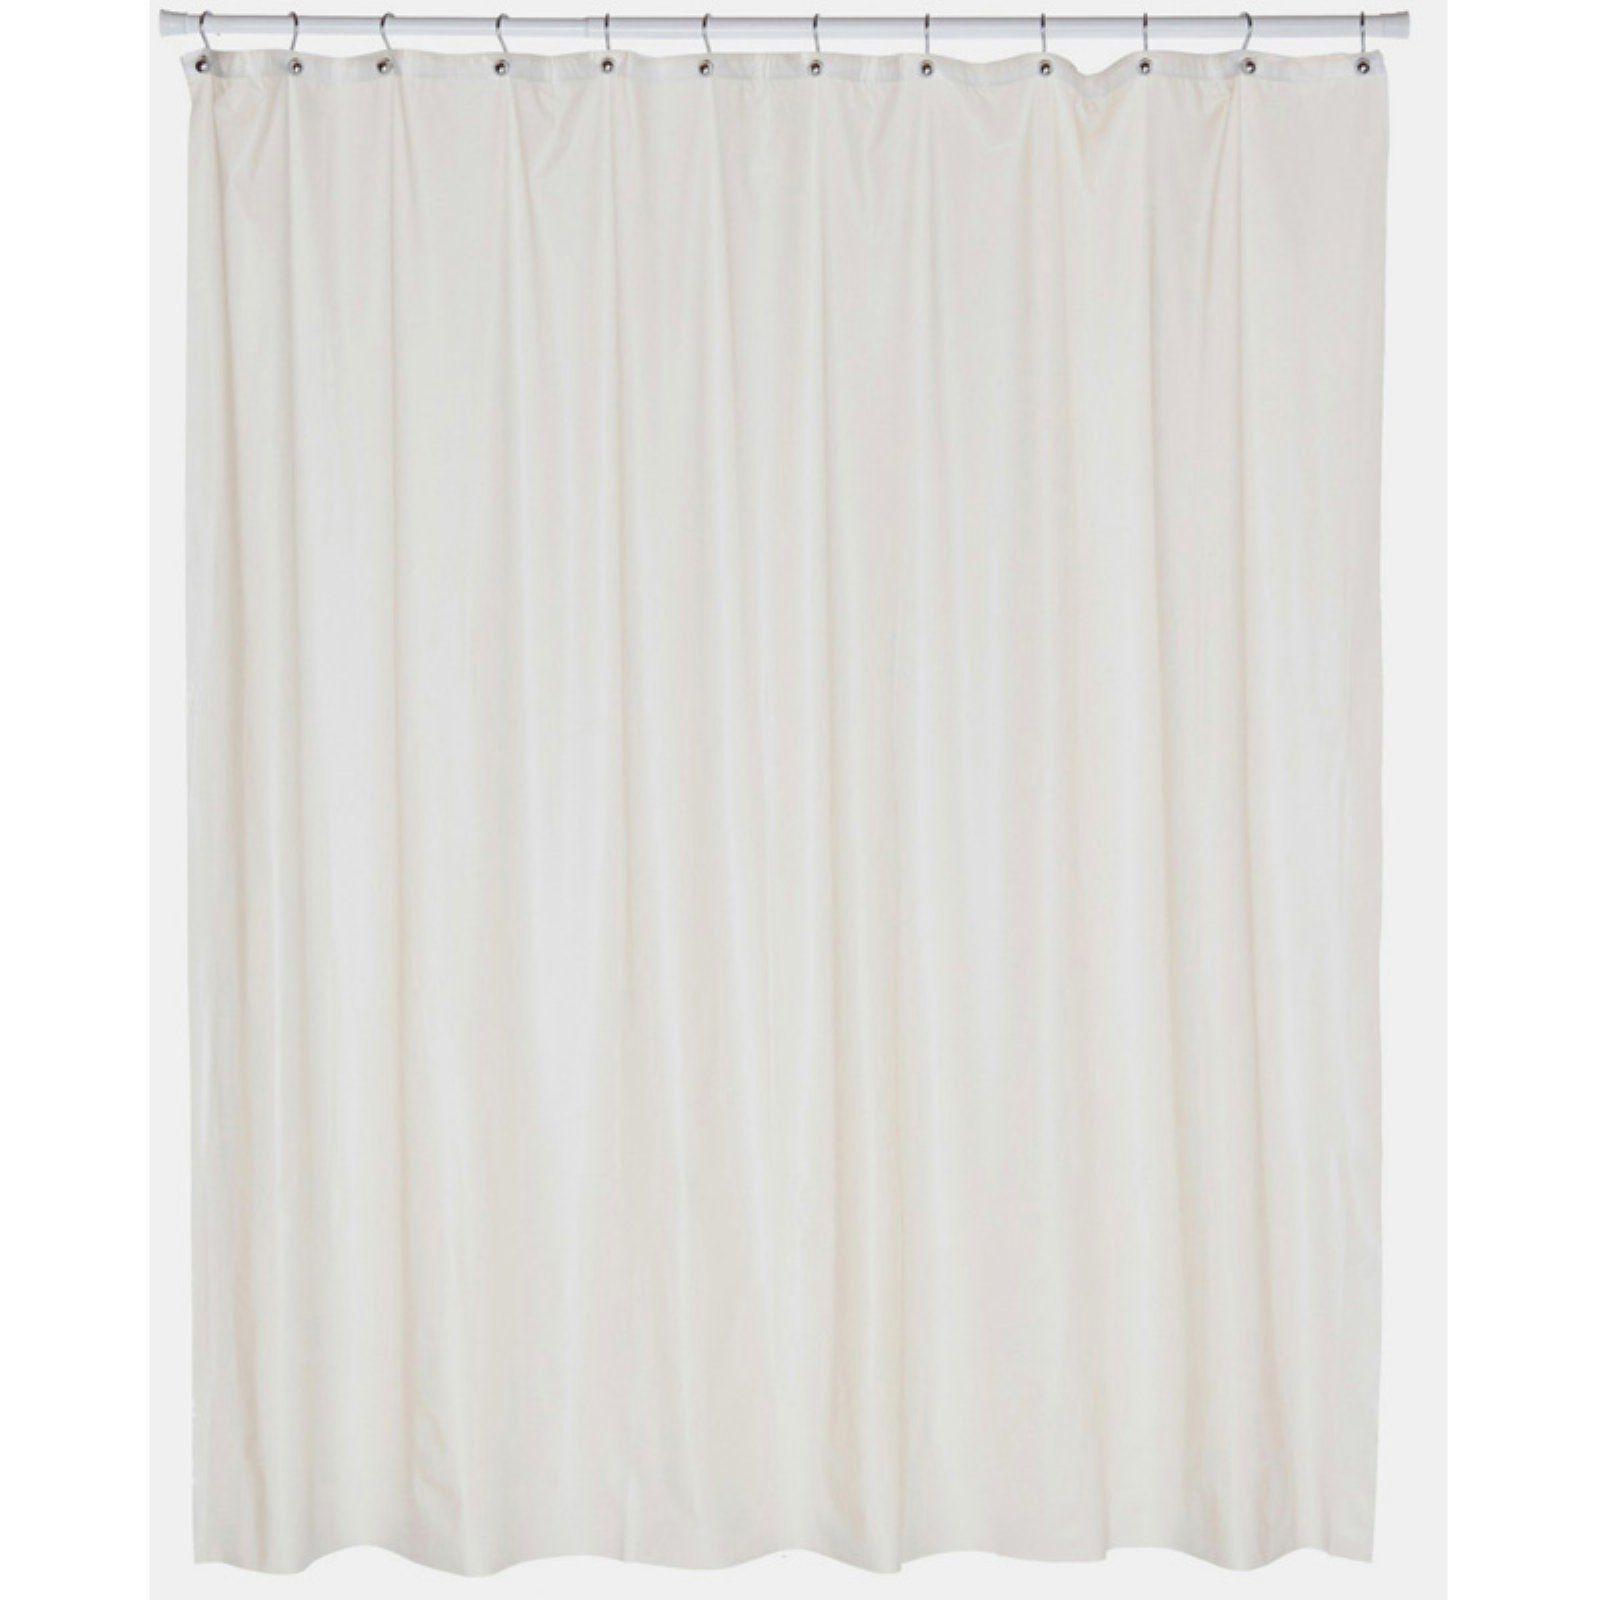 Carnation Home Fashions Peva Shower Curtain Liner Vinyl Shower